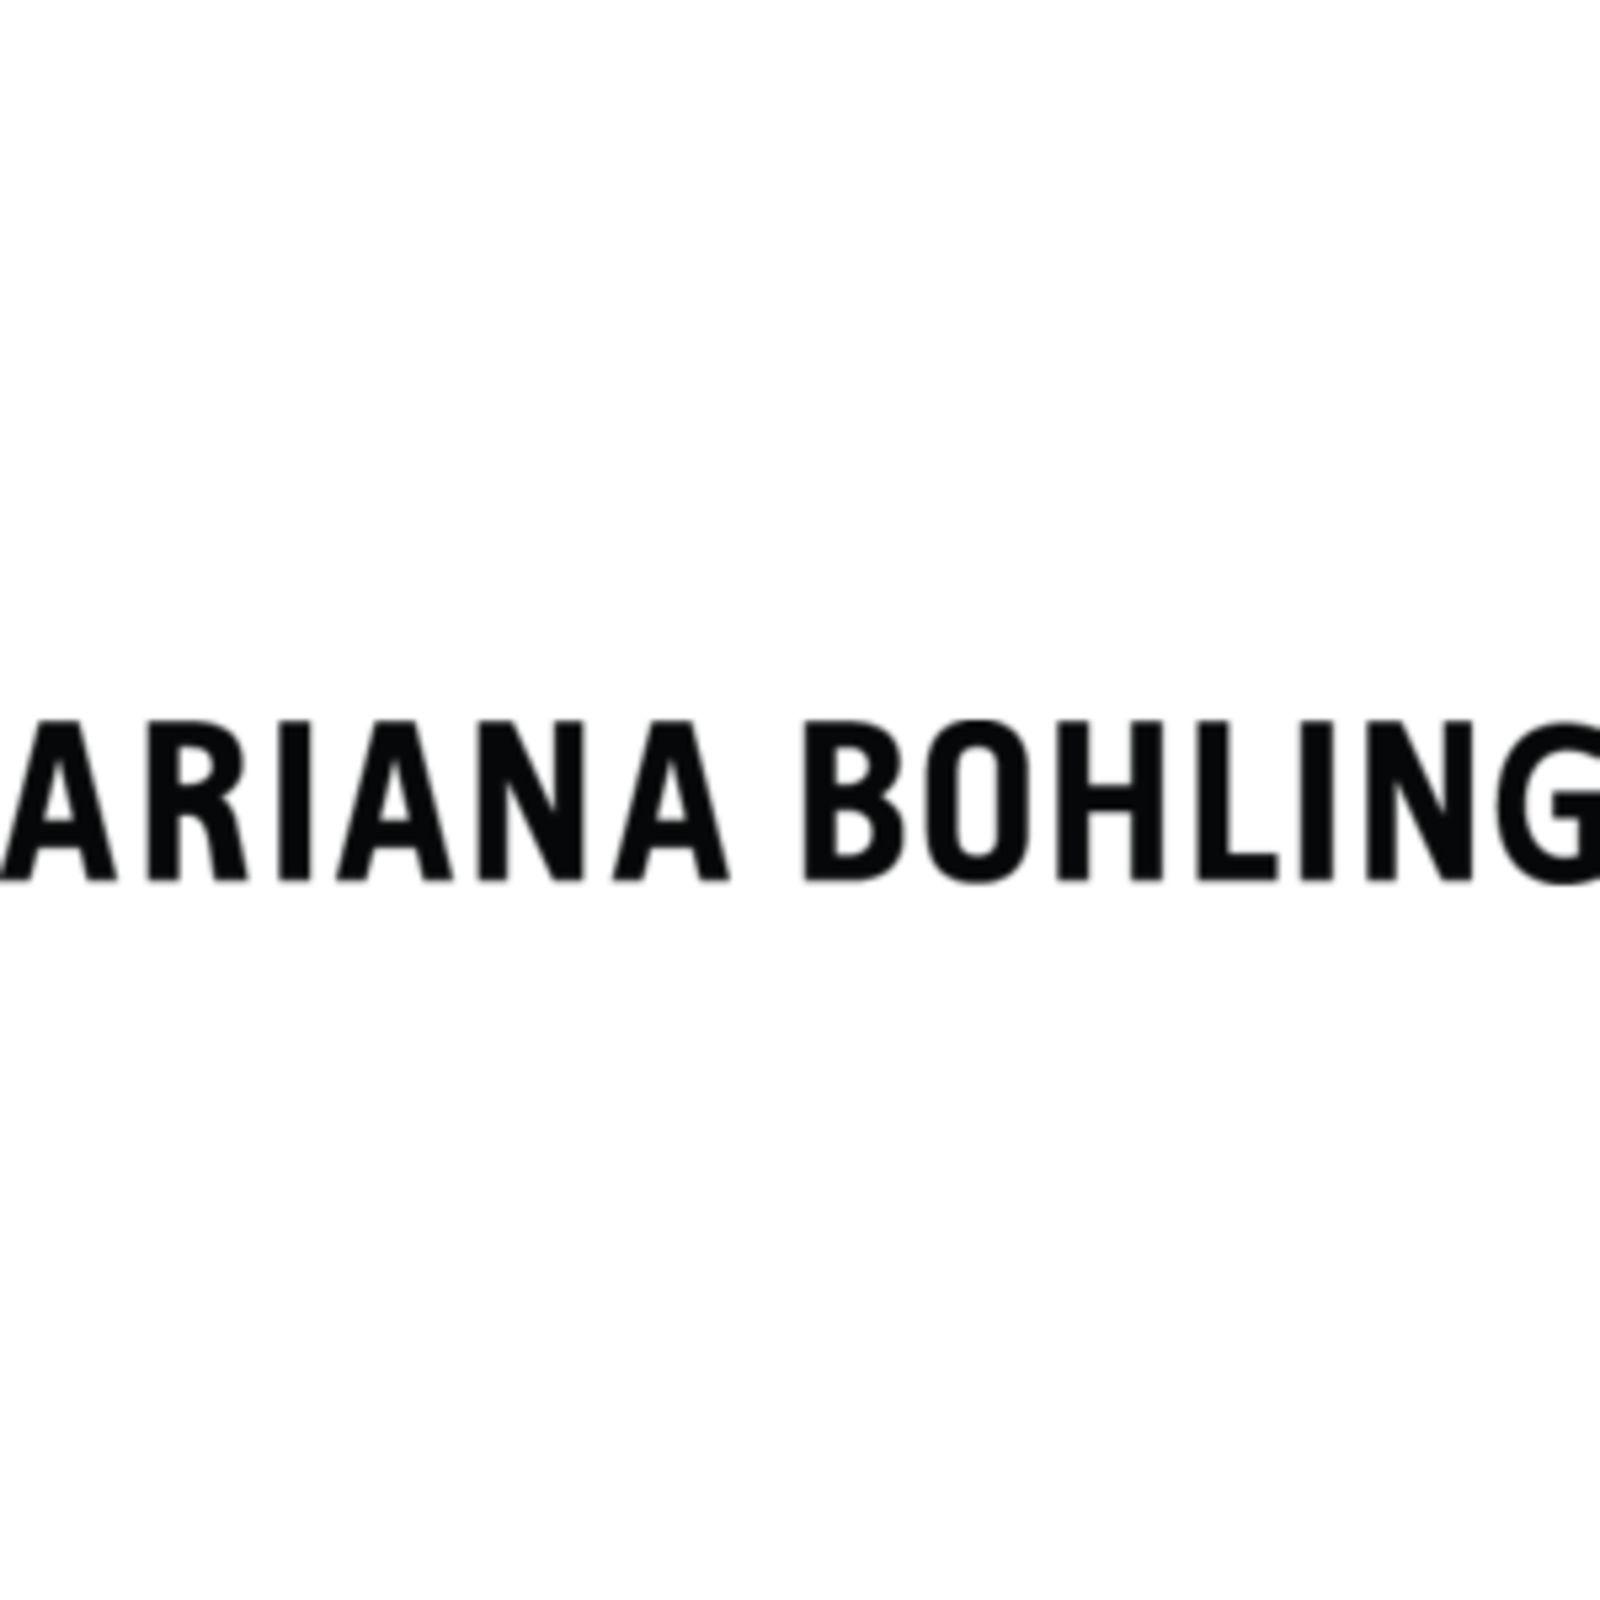 ARIANA BOHLING